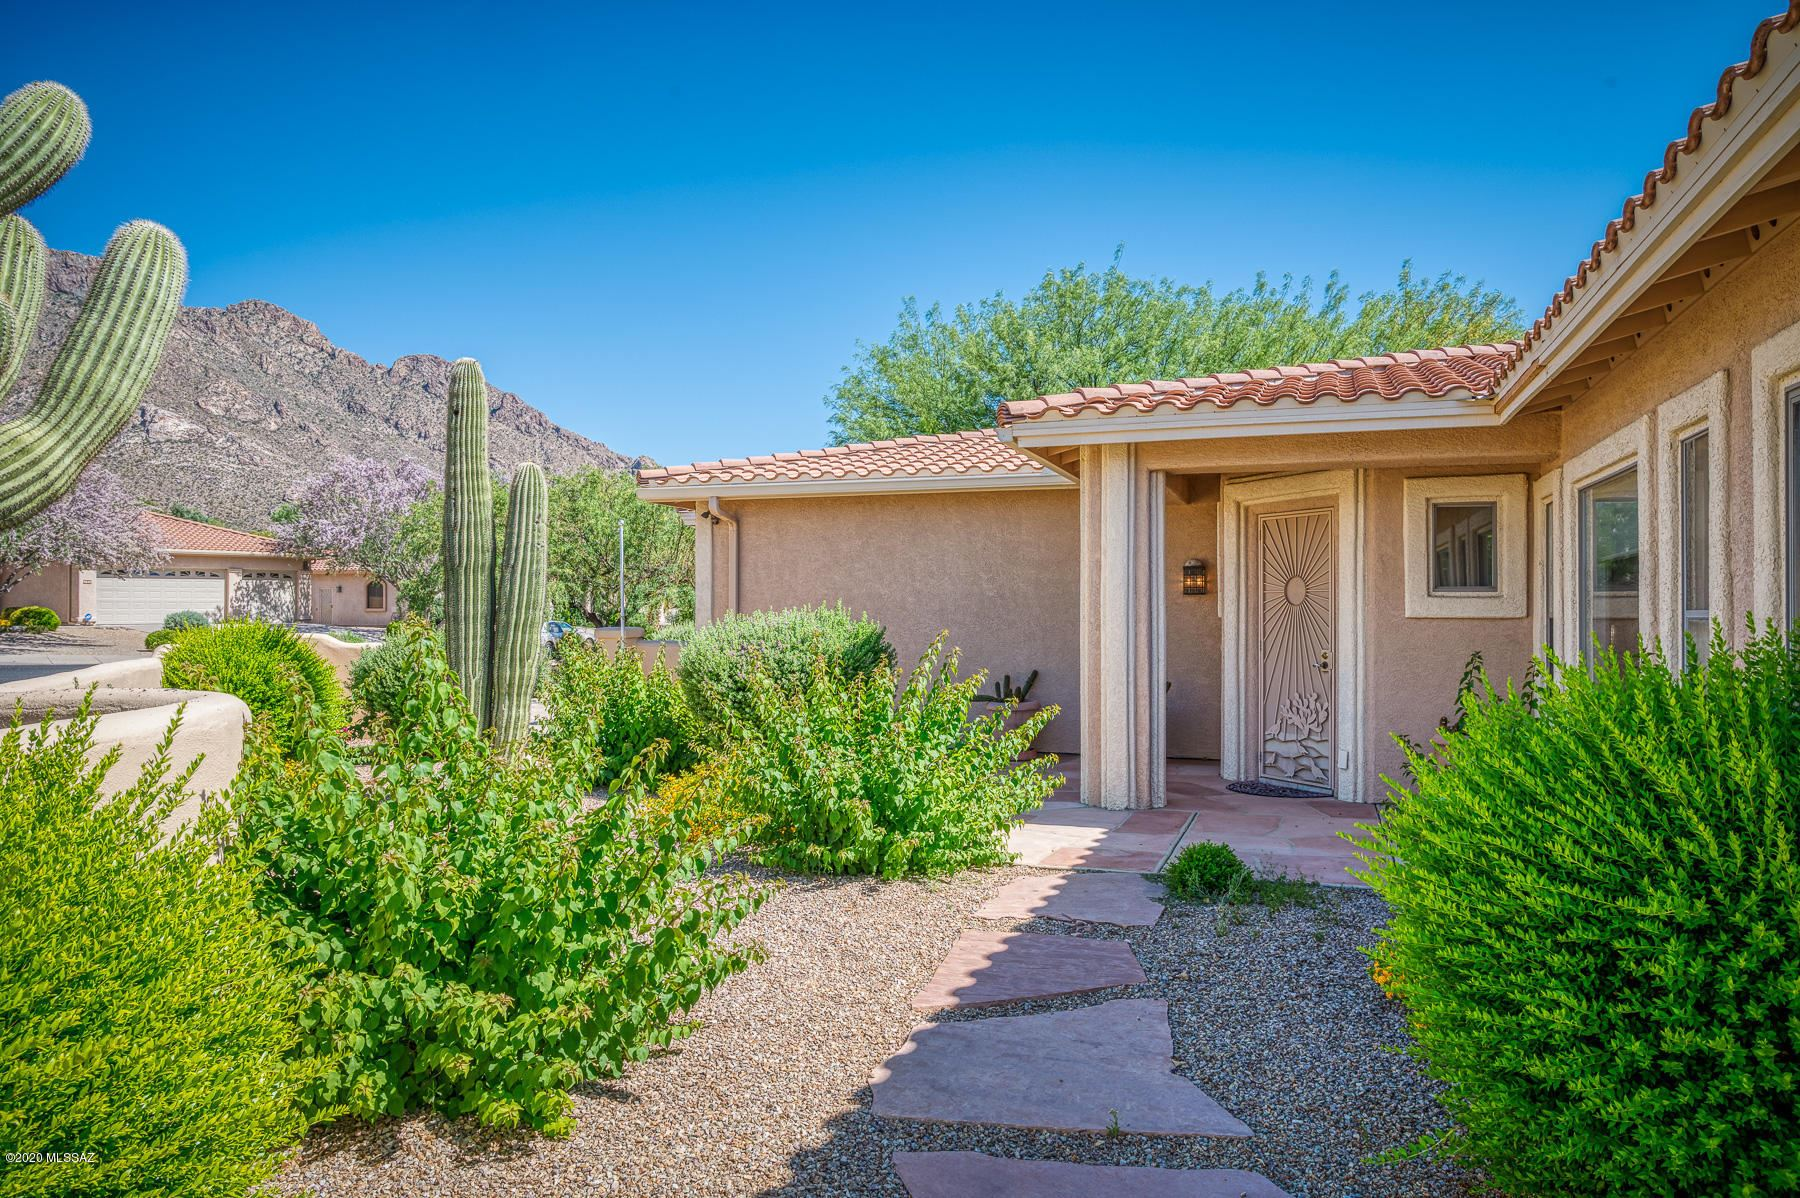 9655 N Golden Sun Drive, Tucson, AZ 85737 - MLS#: 22012620